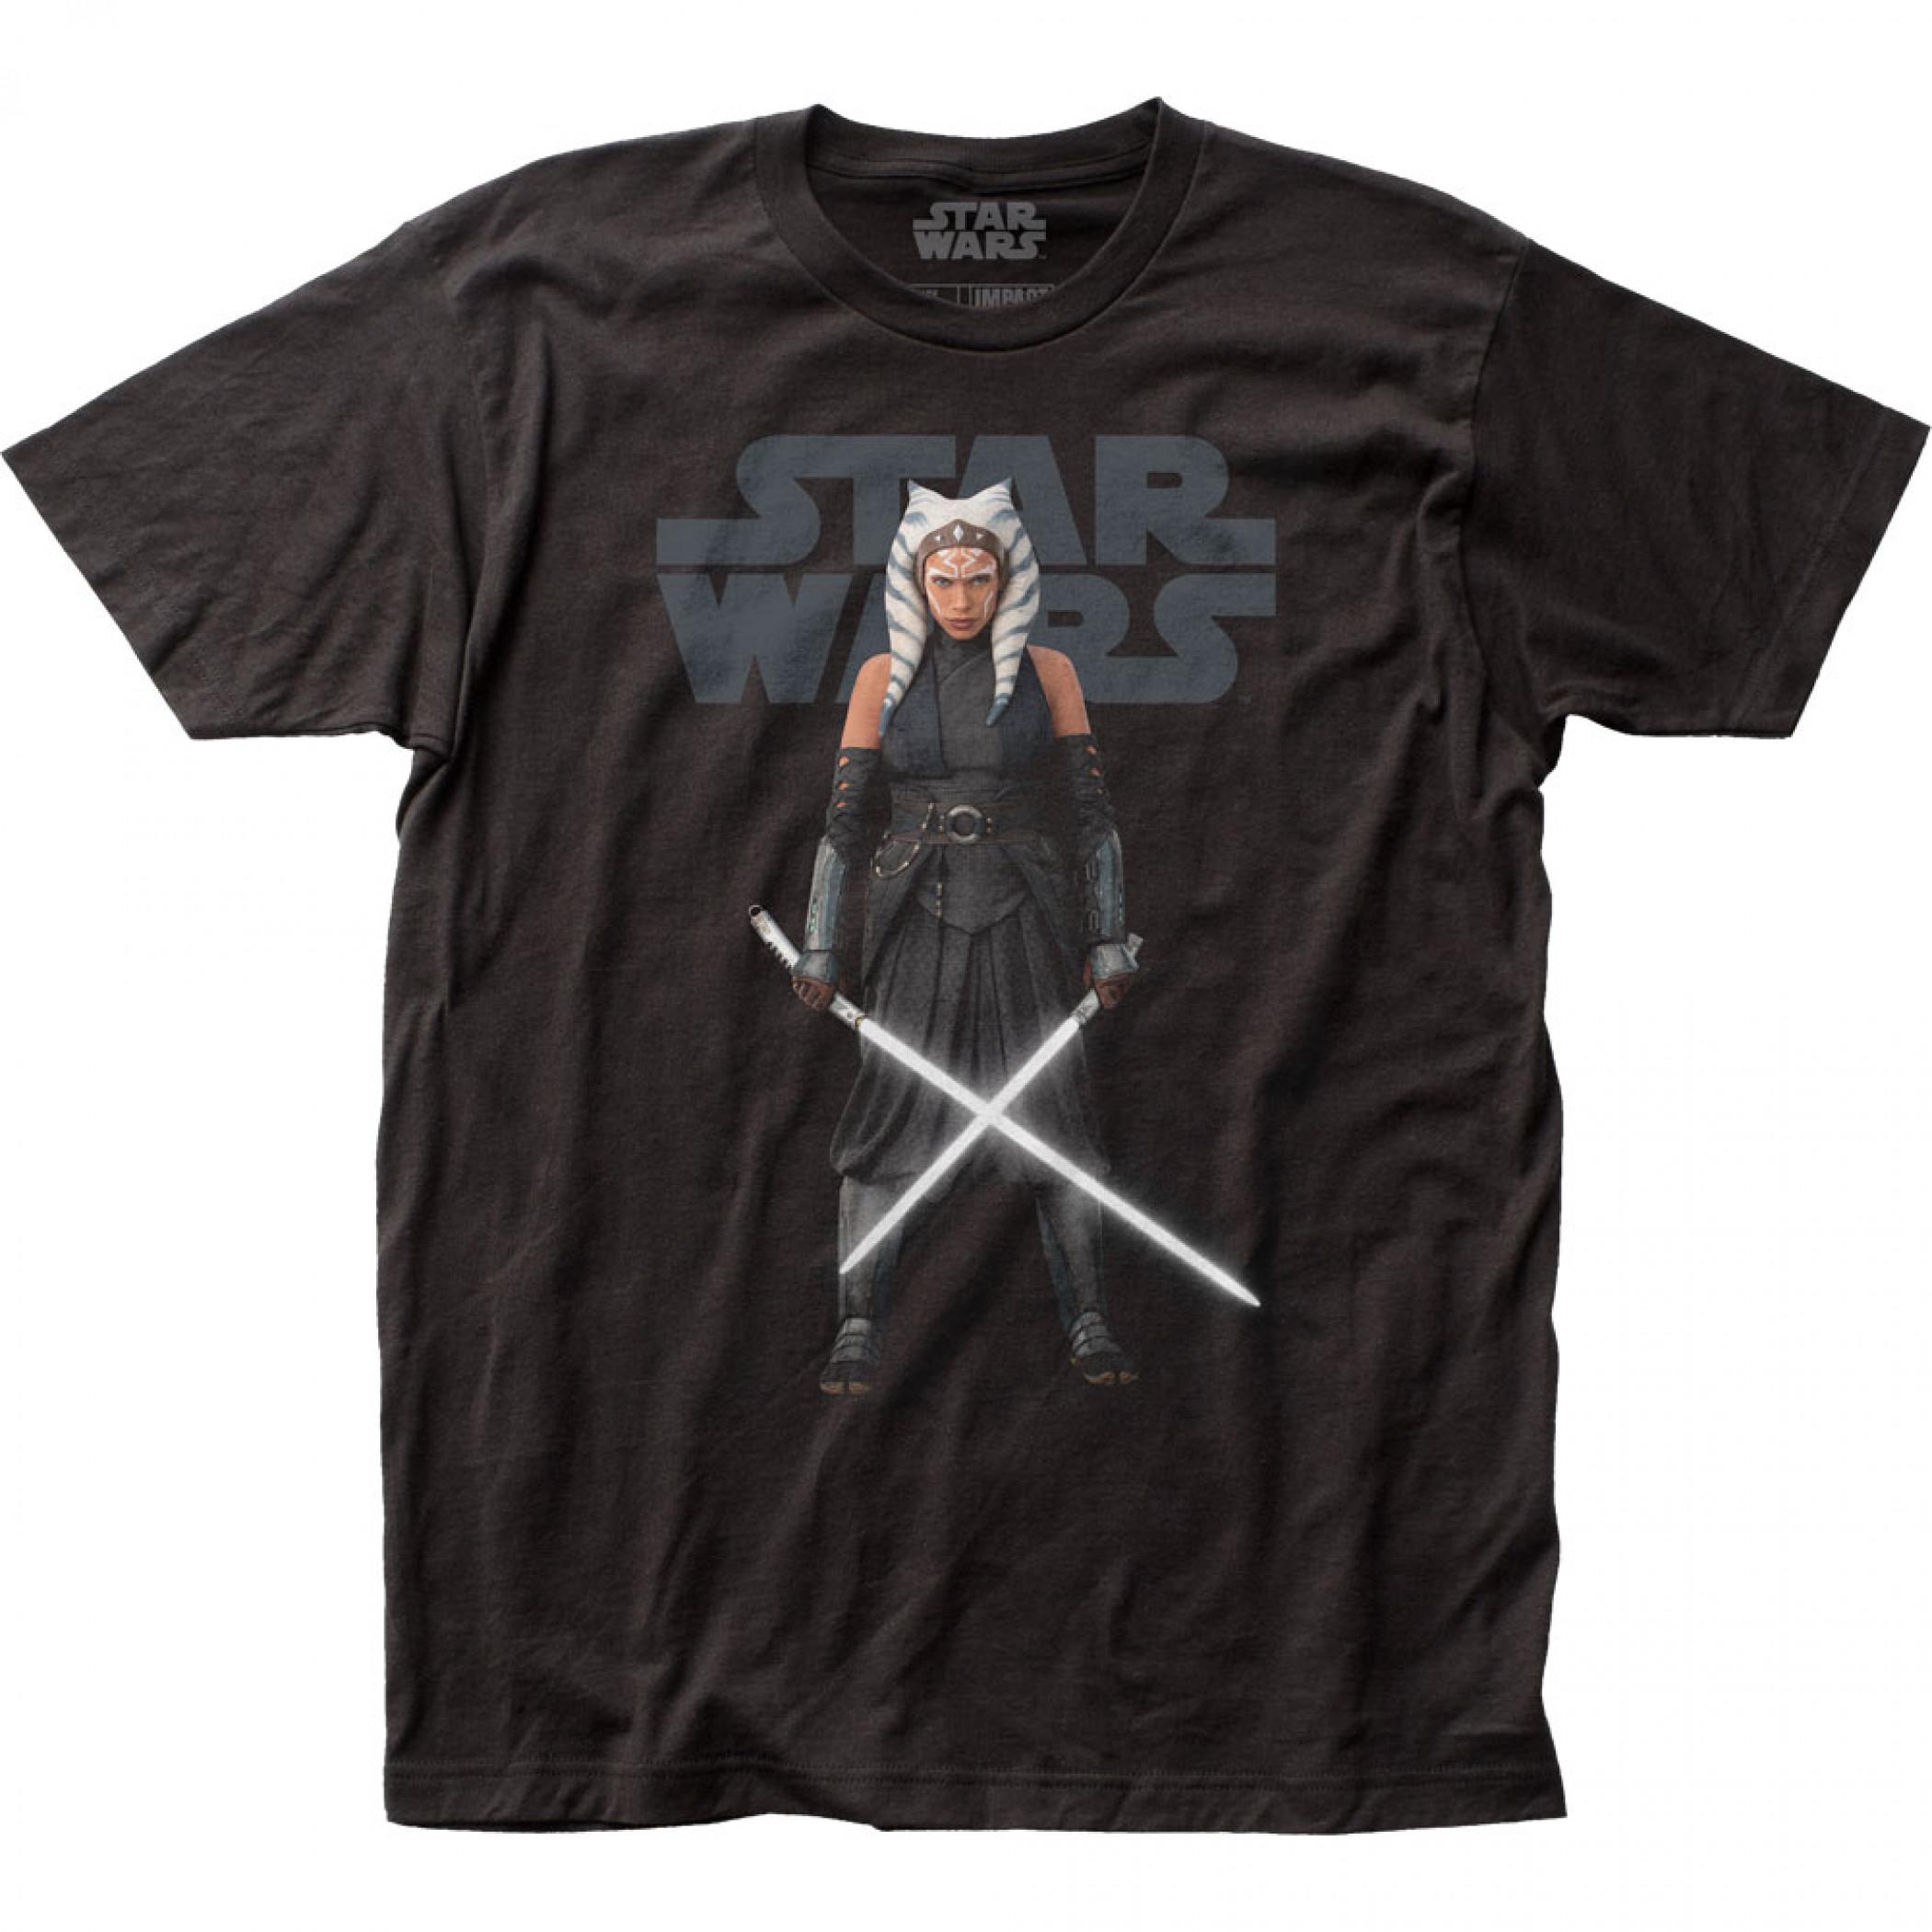 Star Wars The Mandalorian Ahsoka Tano T-Shirt